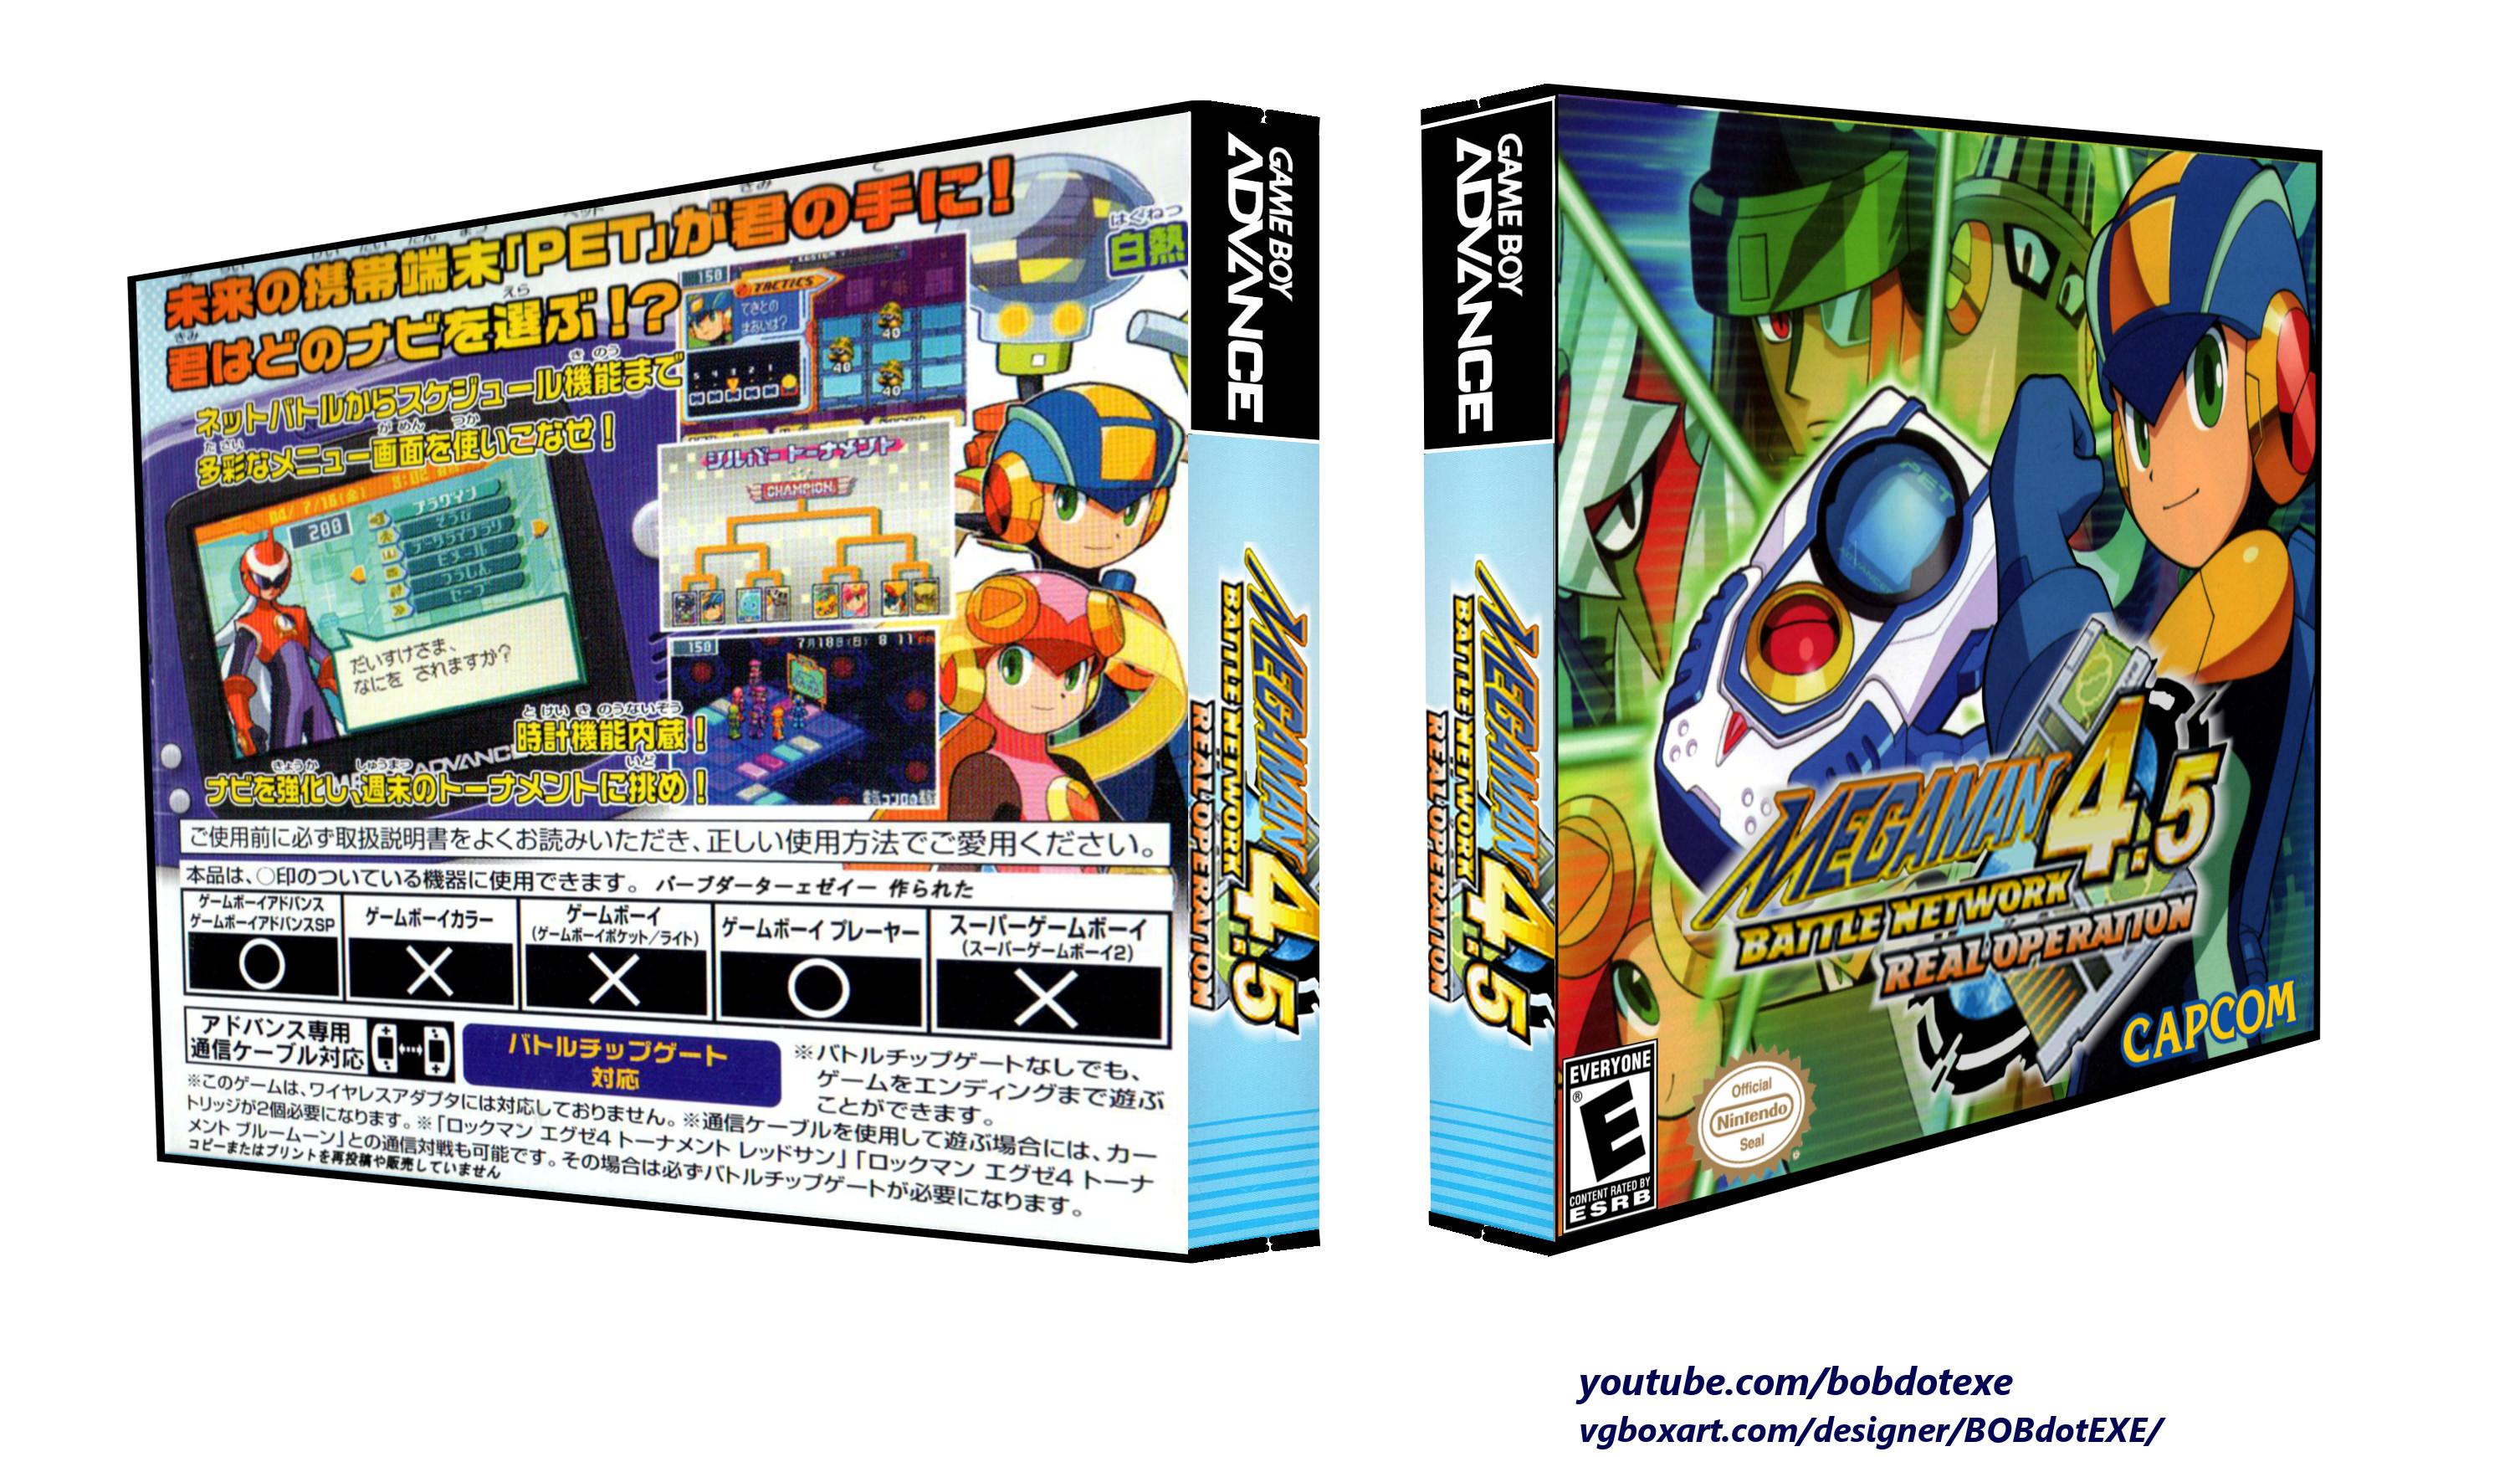 … Megaman battle network 4.5 Box Art (DS Sized Box) by bobdotexe